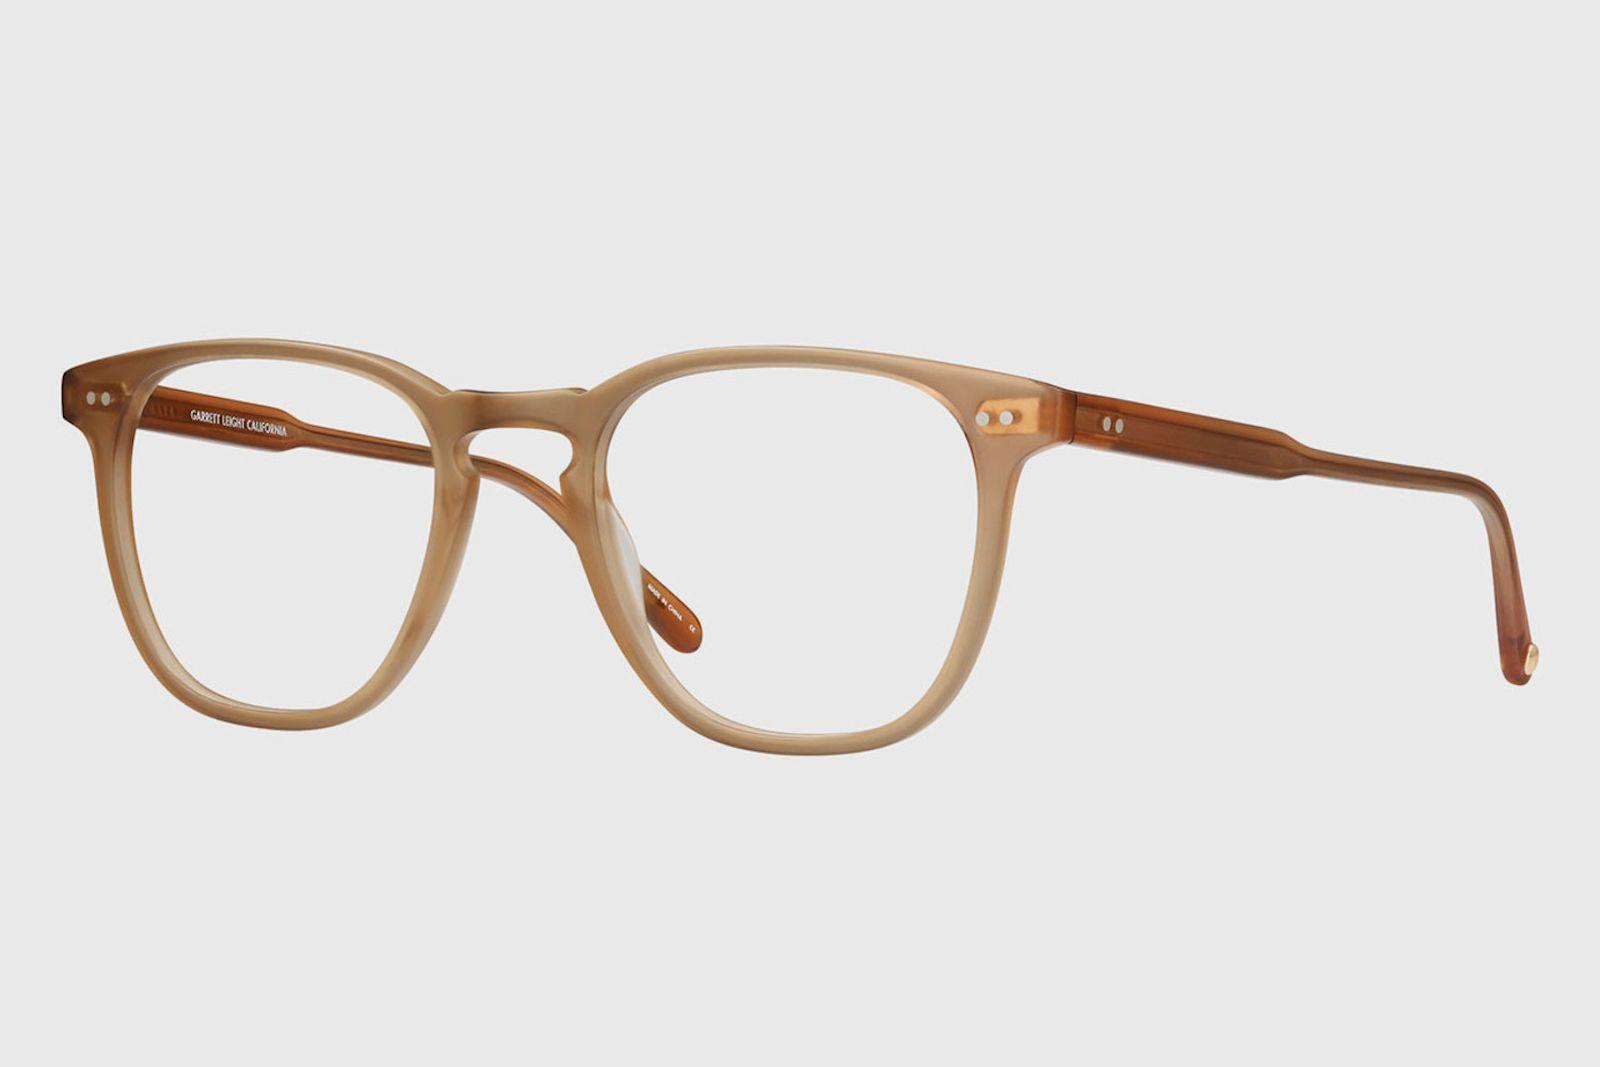 garrett leight jjjjound Brooks 47 eyeglasses